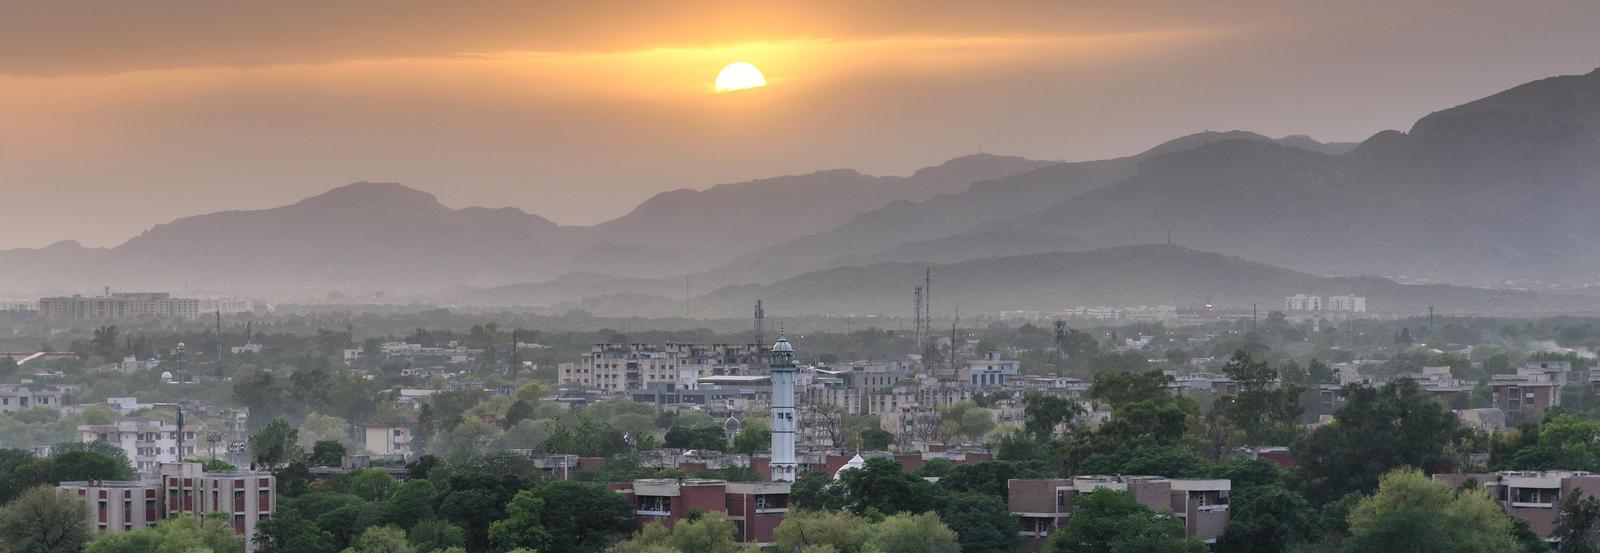 vista of a city in Pakistan